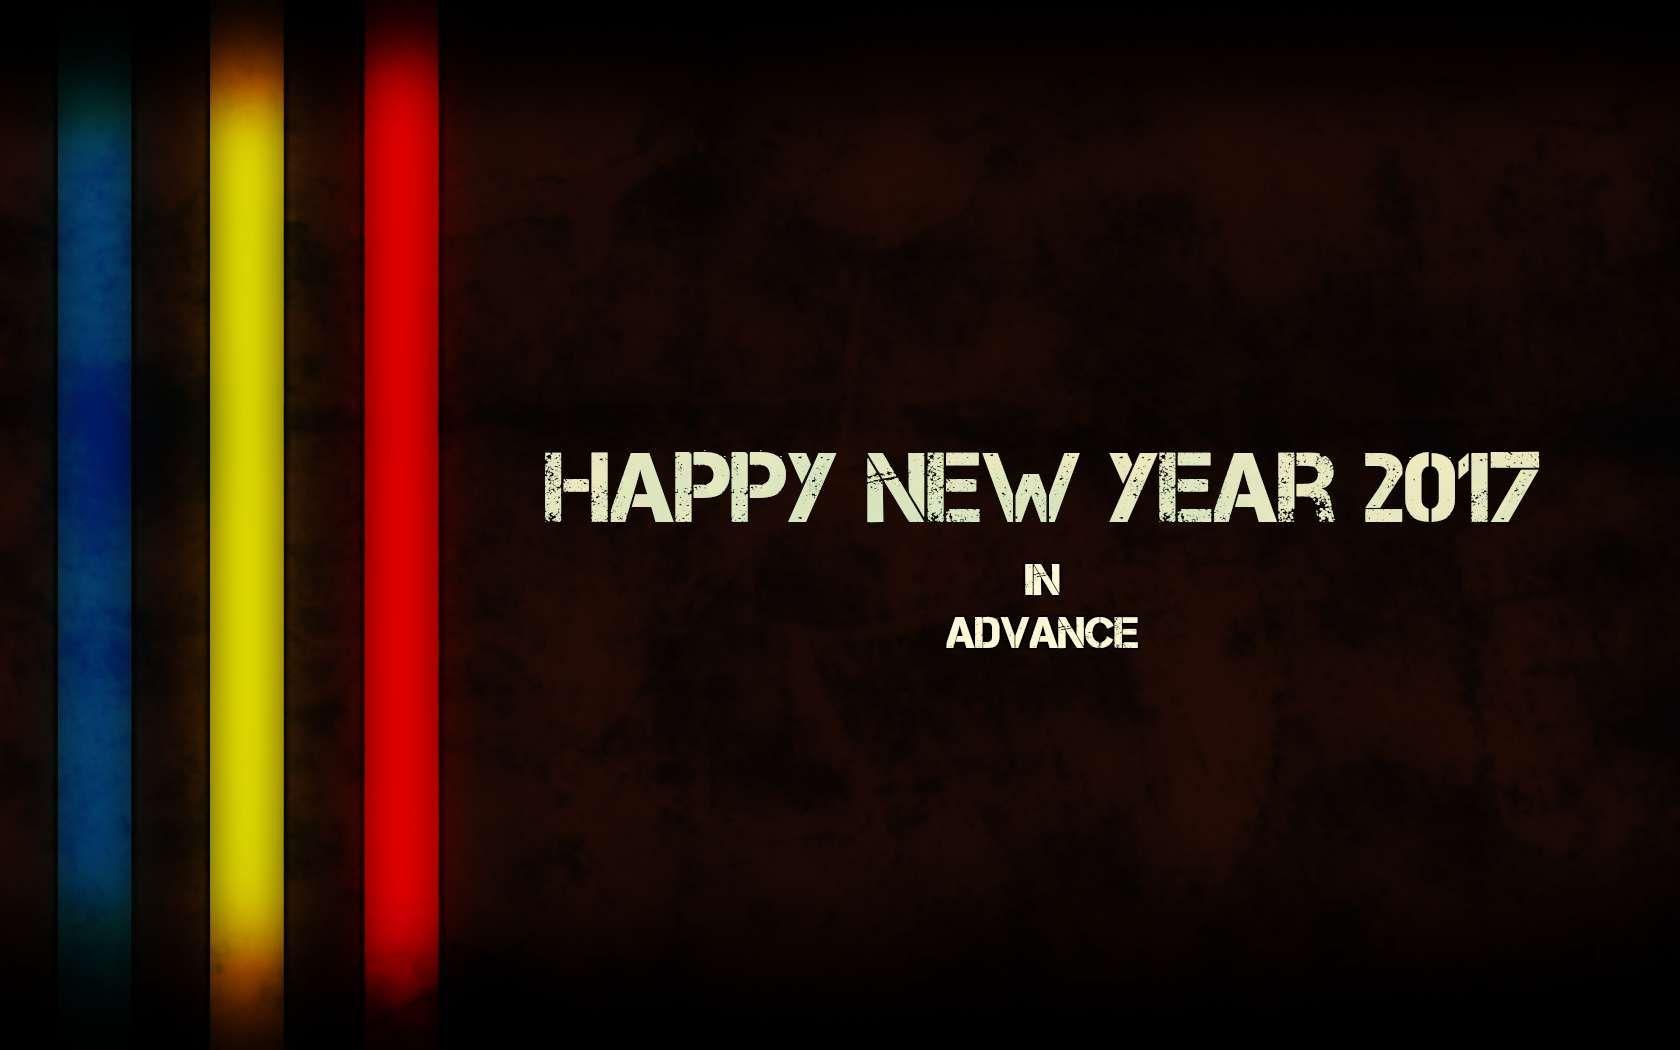 Advance Happy New Year 2017 Image Happy New Year 2019 New Year 2017 Merry Christmas And Happy New Year